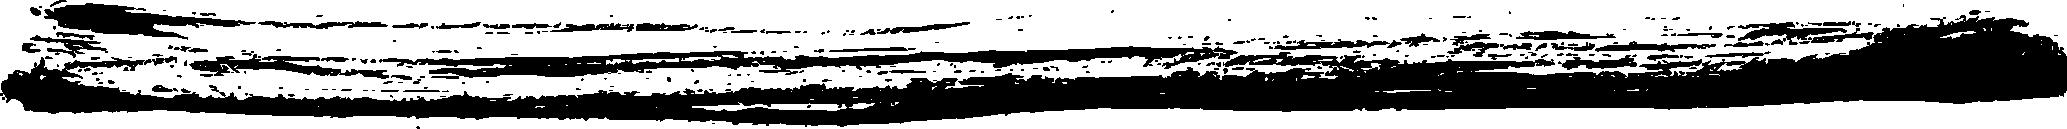 18 Grunge Line (PNG Transparent) | OnlyGFX.com